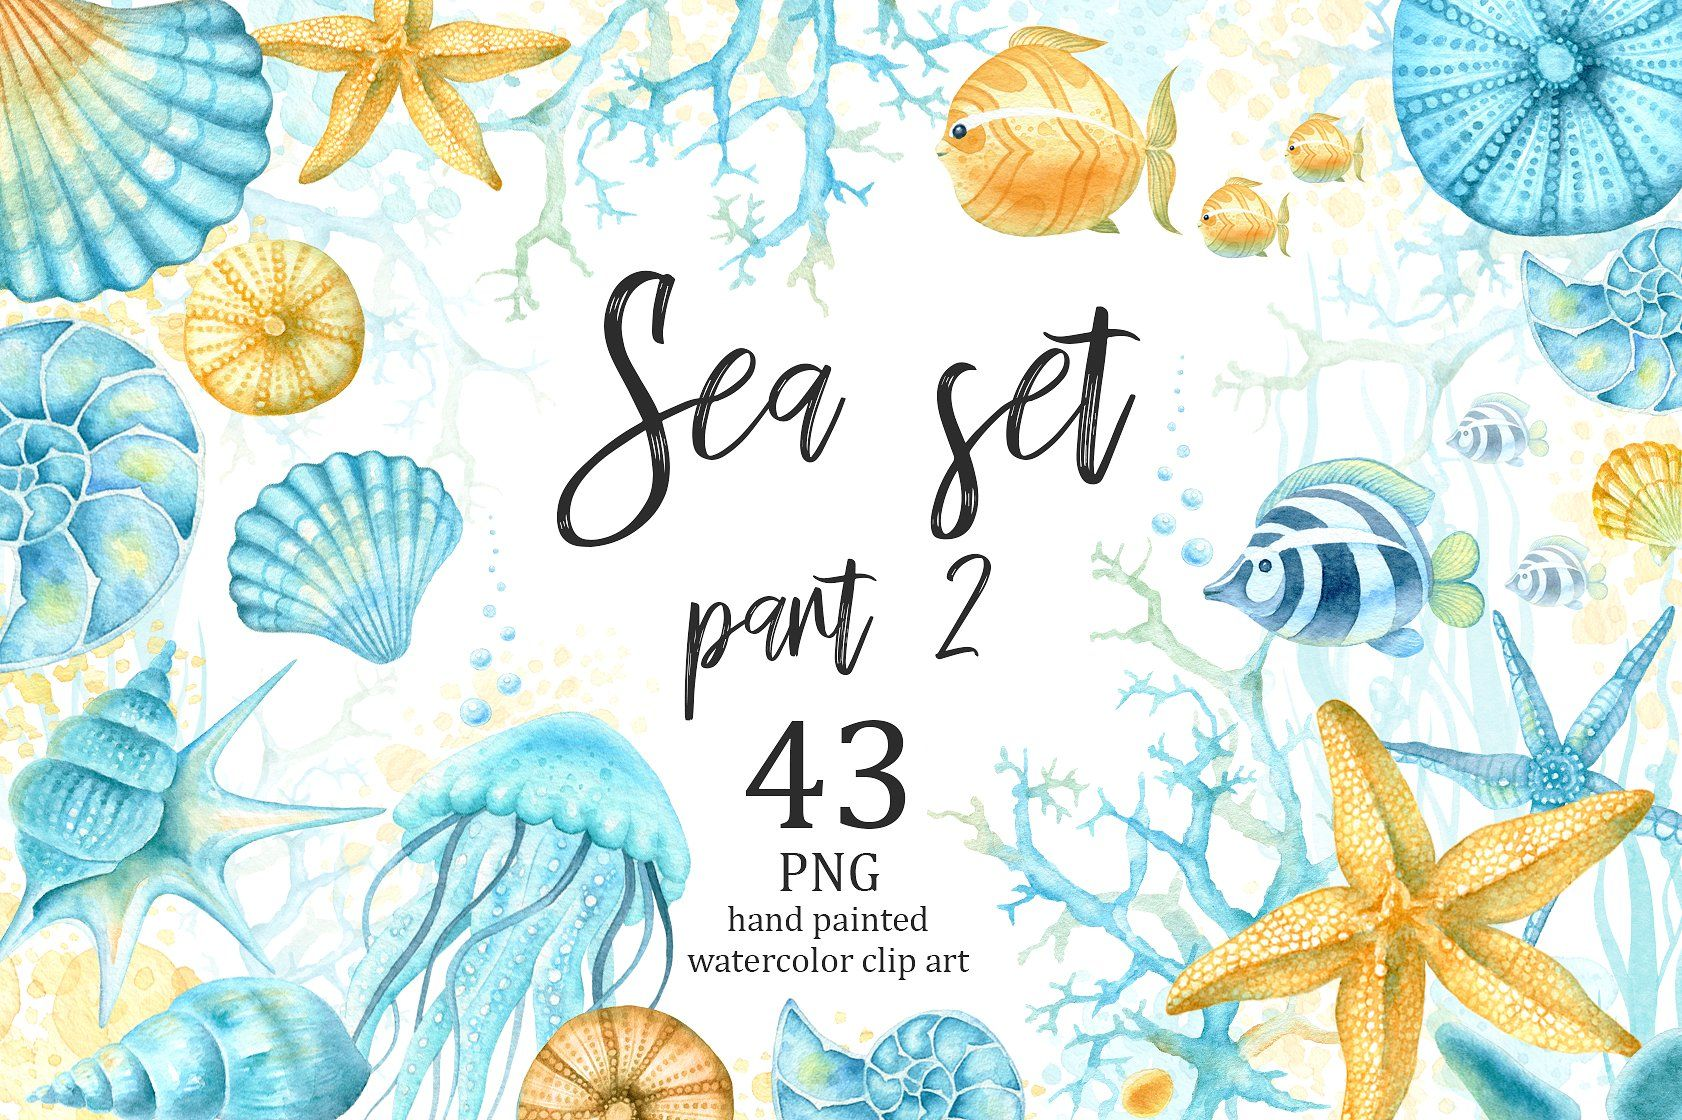 Watercolor Sea Clipart Part 2 Sea Clipart Watercolor Sea Clip Art